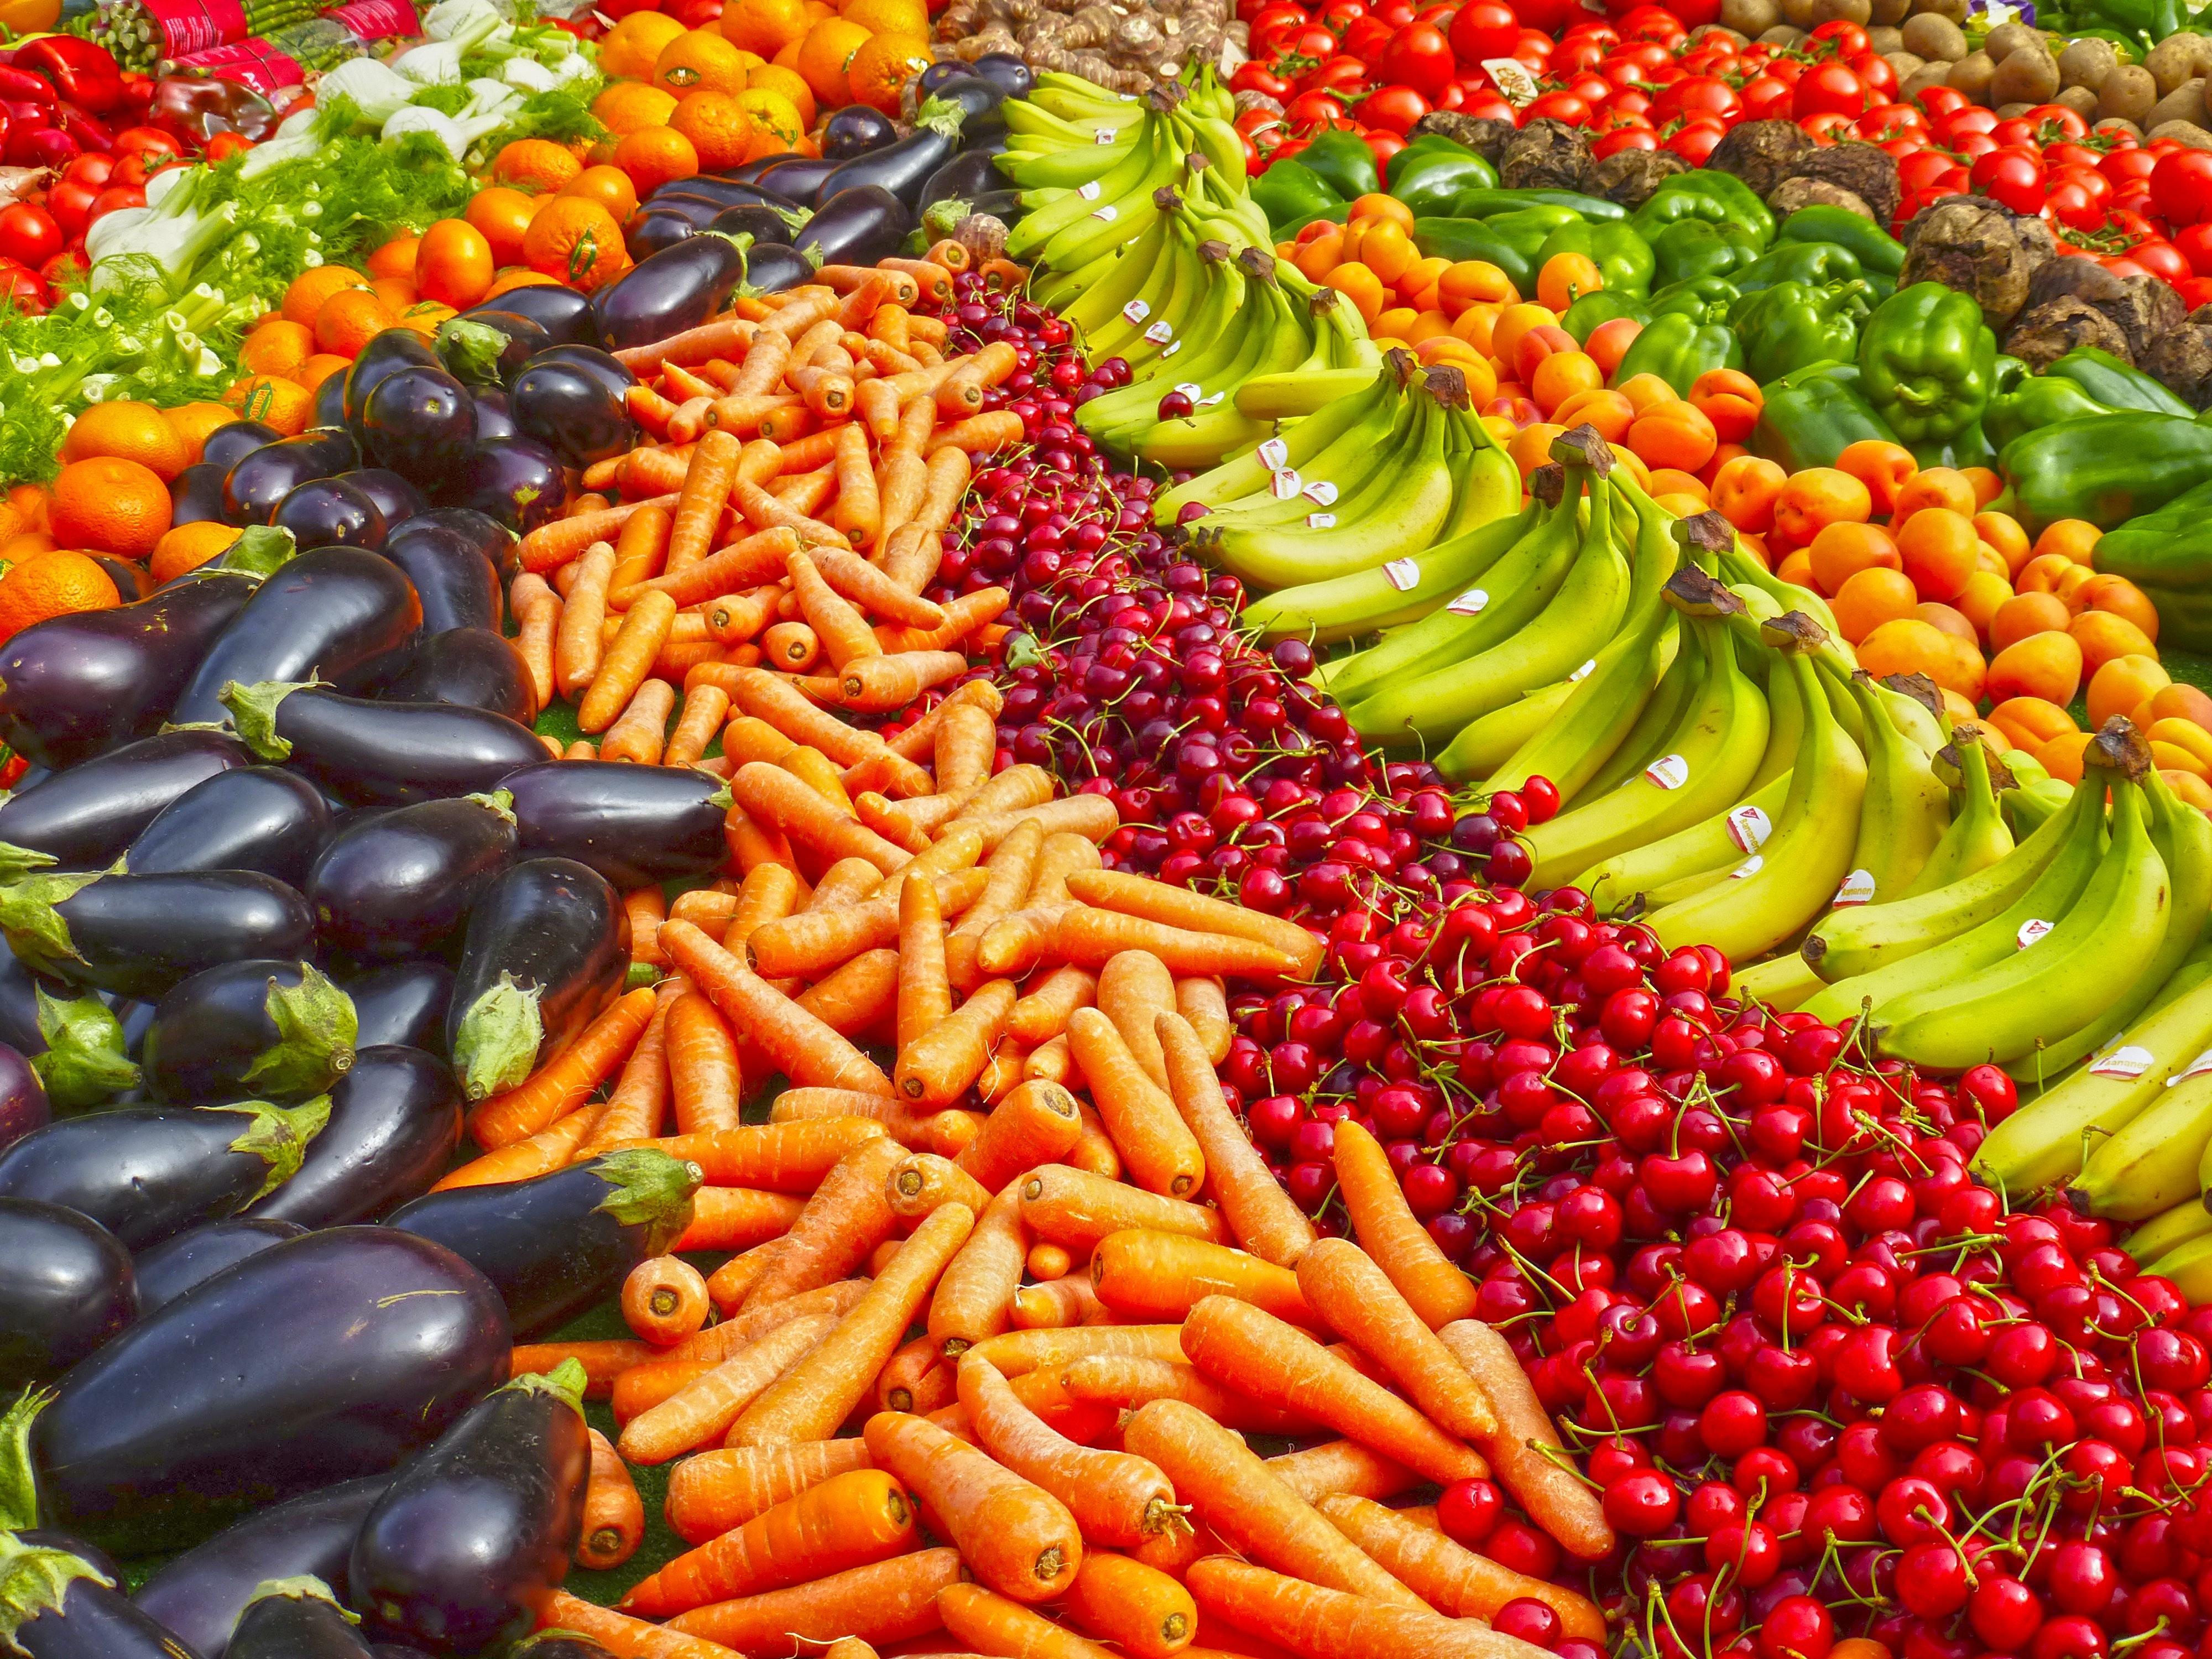 500 amazing nutrition photos 183 pexels 183 free stock photos